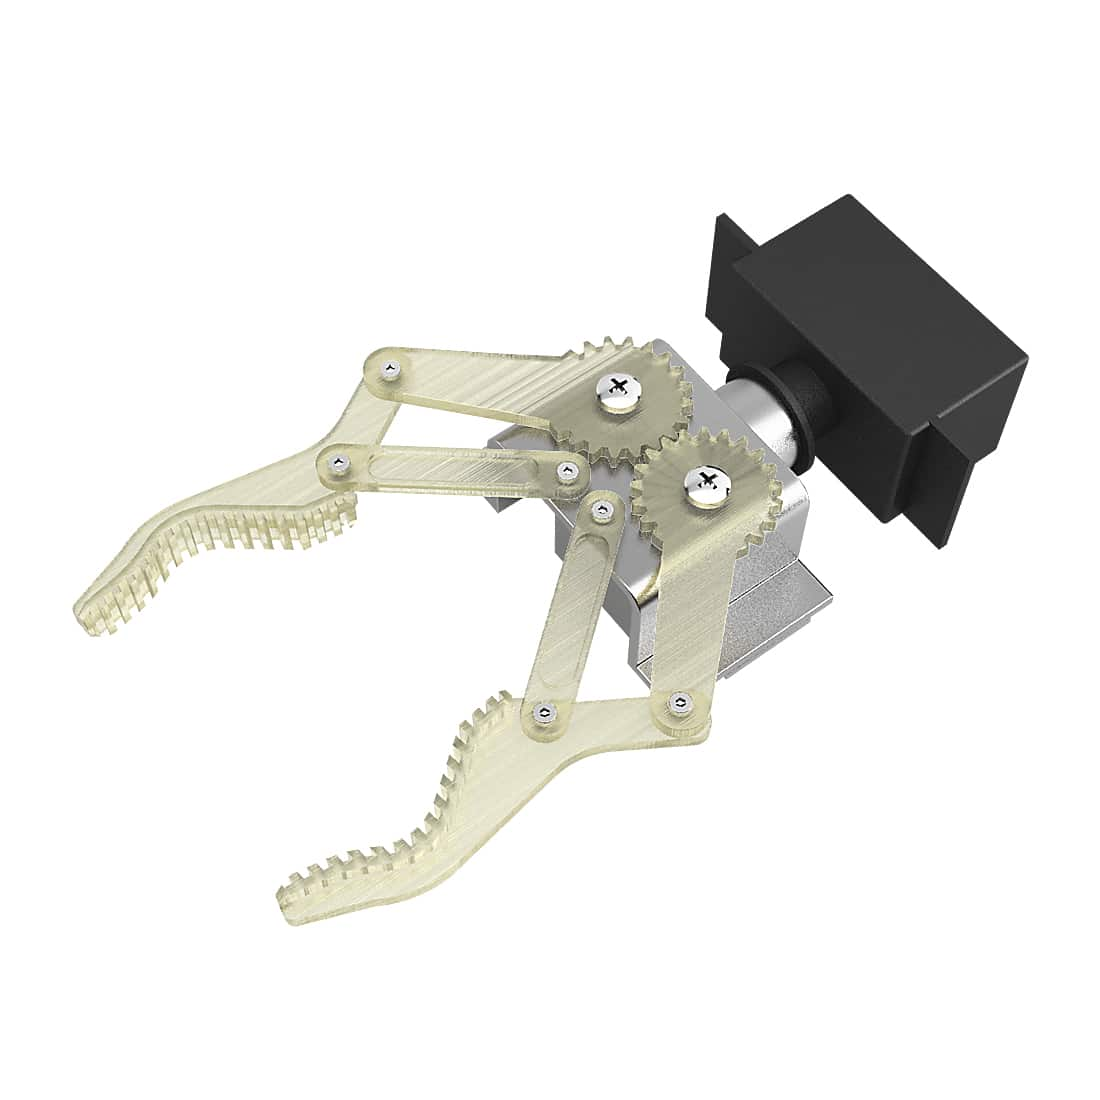 3D Druck Prototyp Greifer